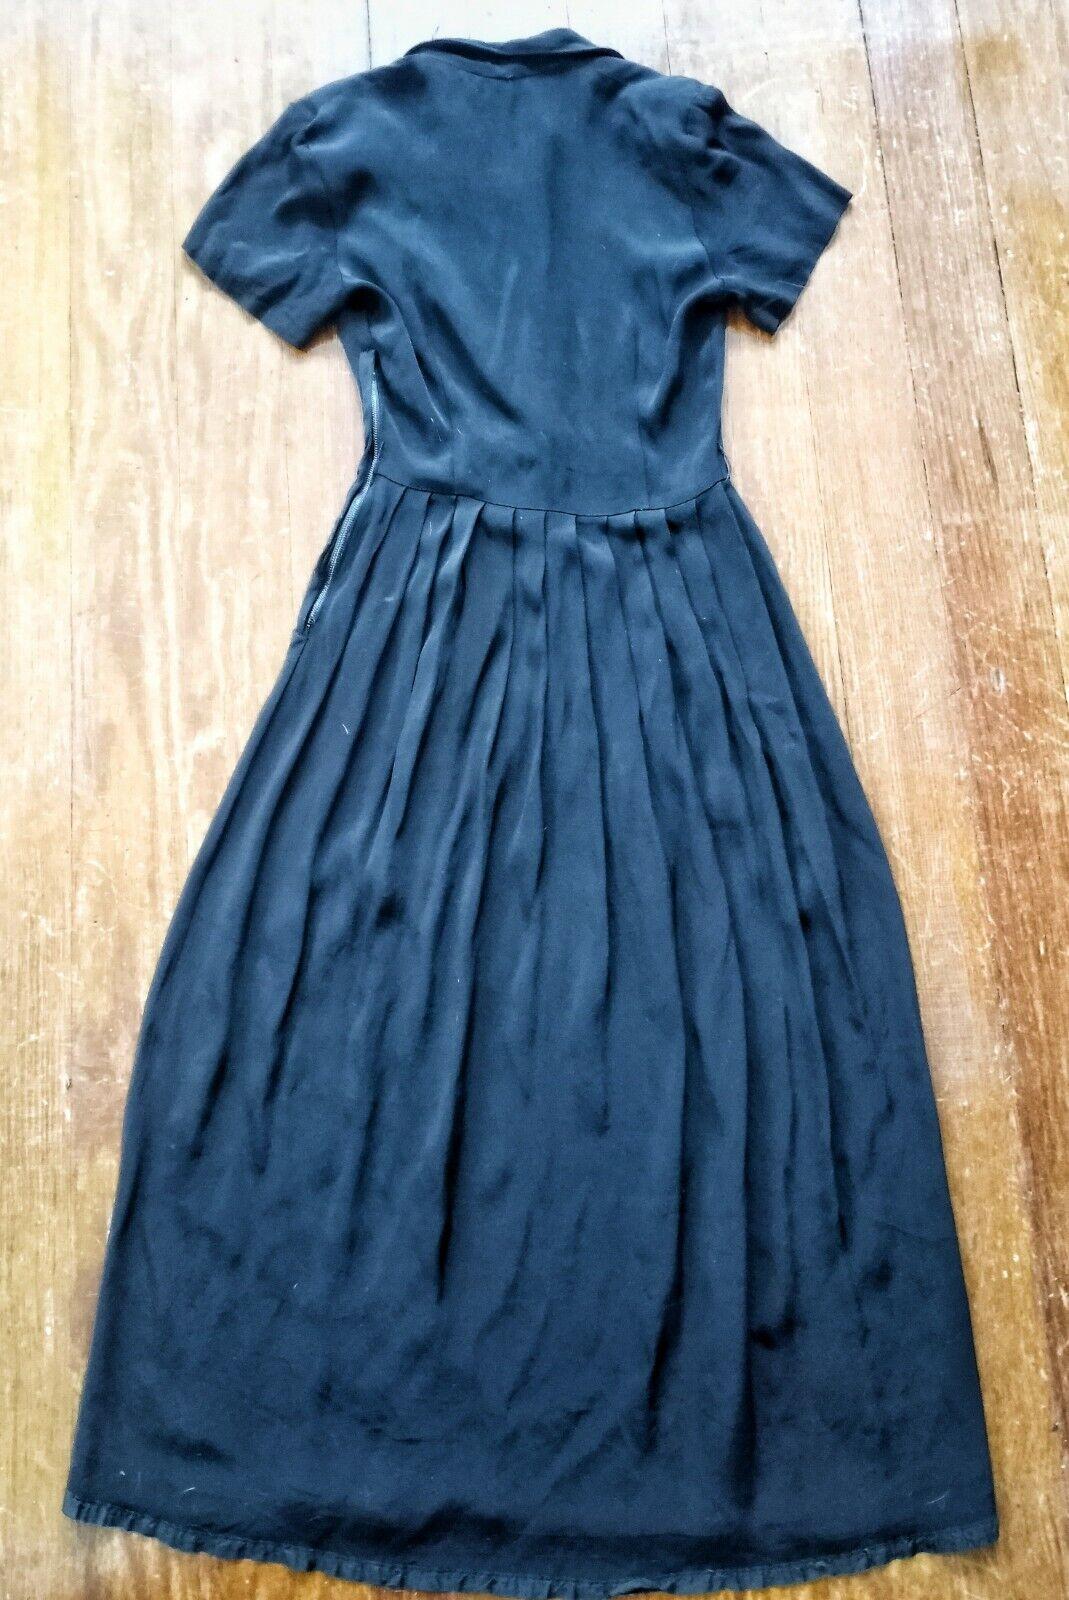 Vintage 1940's Black Rayon Dress - image 5